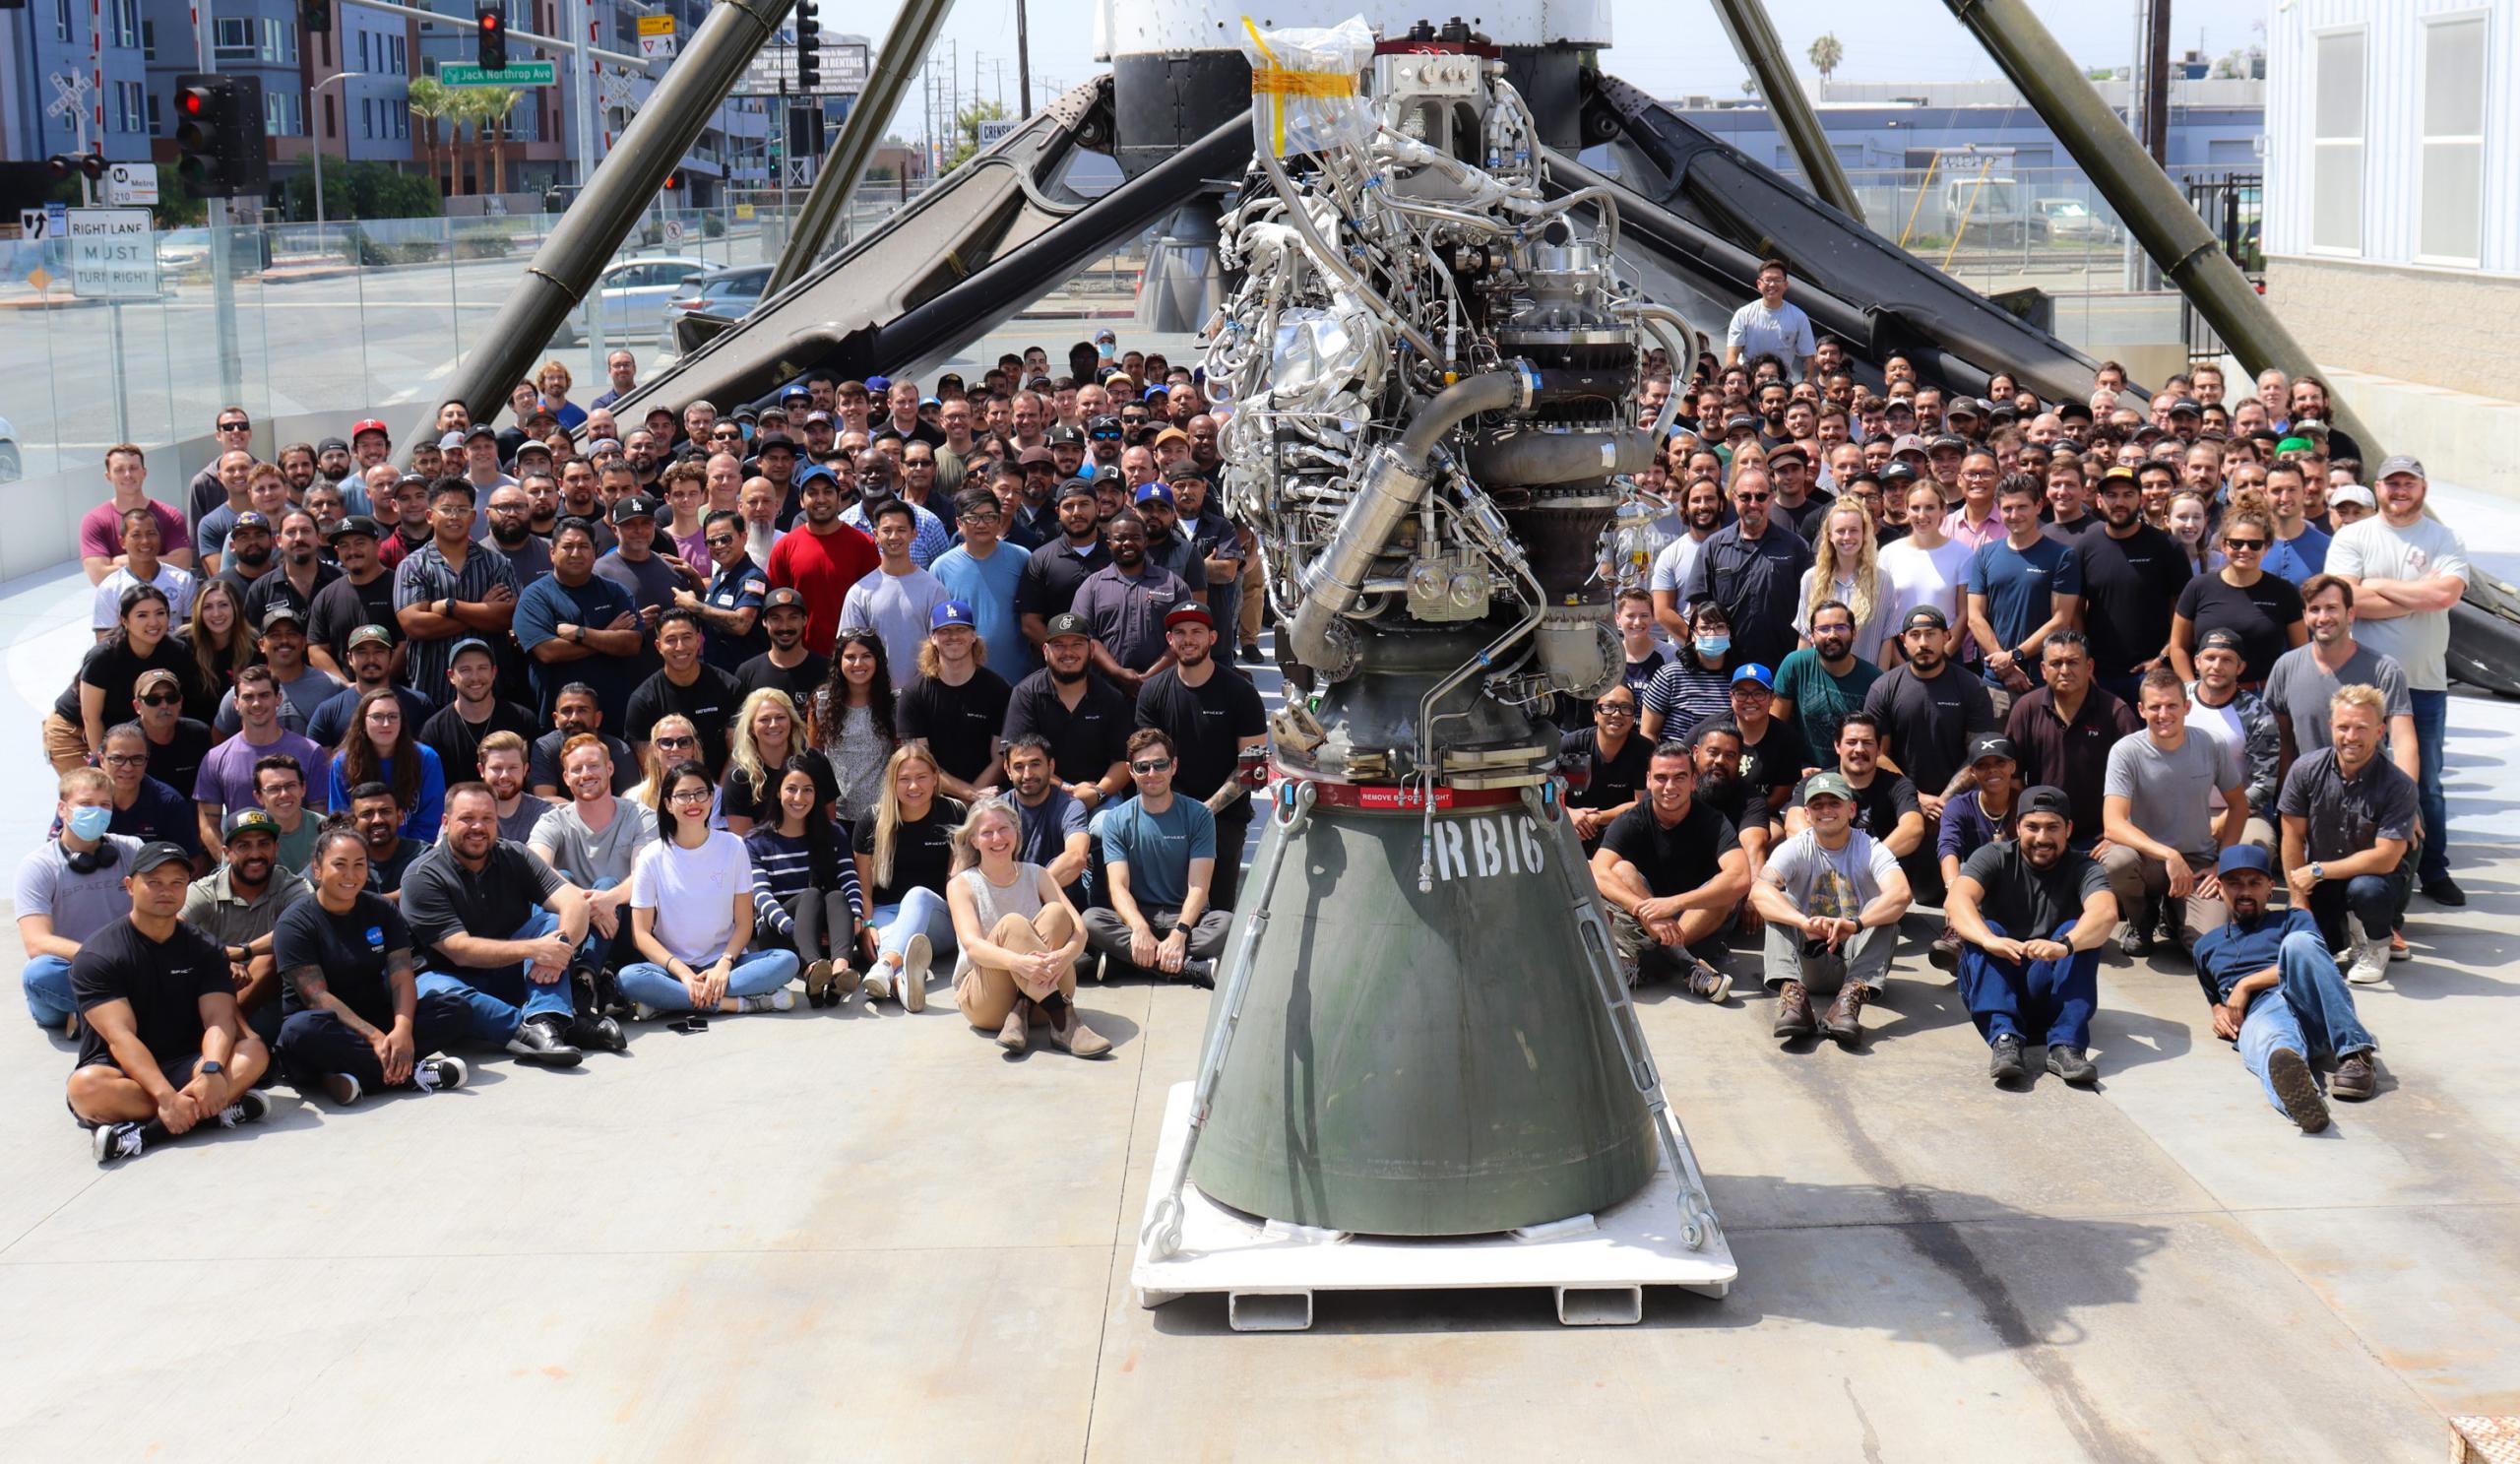 RB16 100th Raptor build Hawthorne 072621 (SpaceX) 2 crop (c)